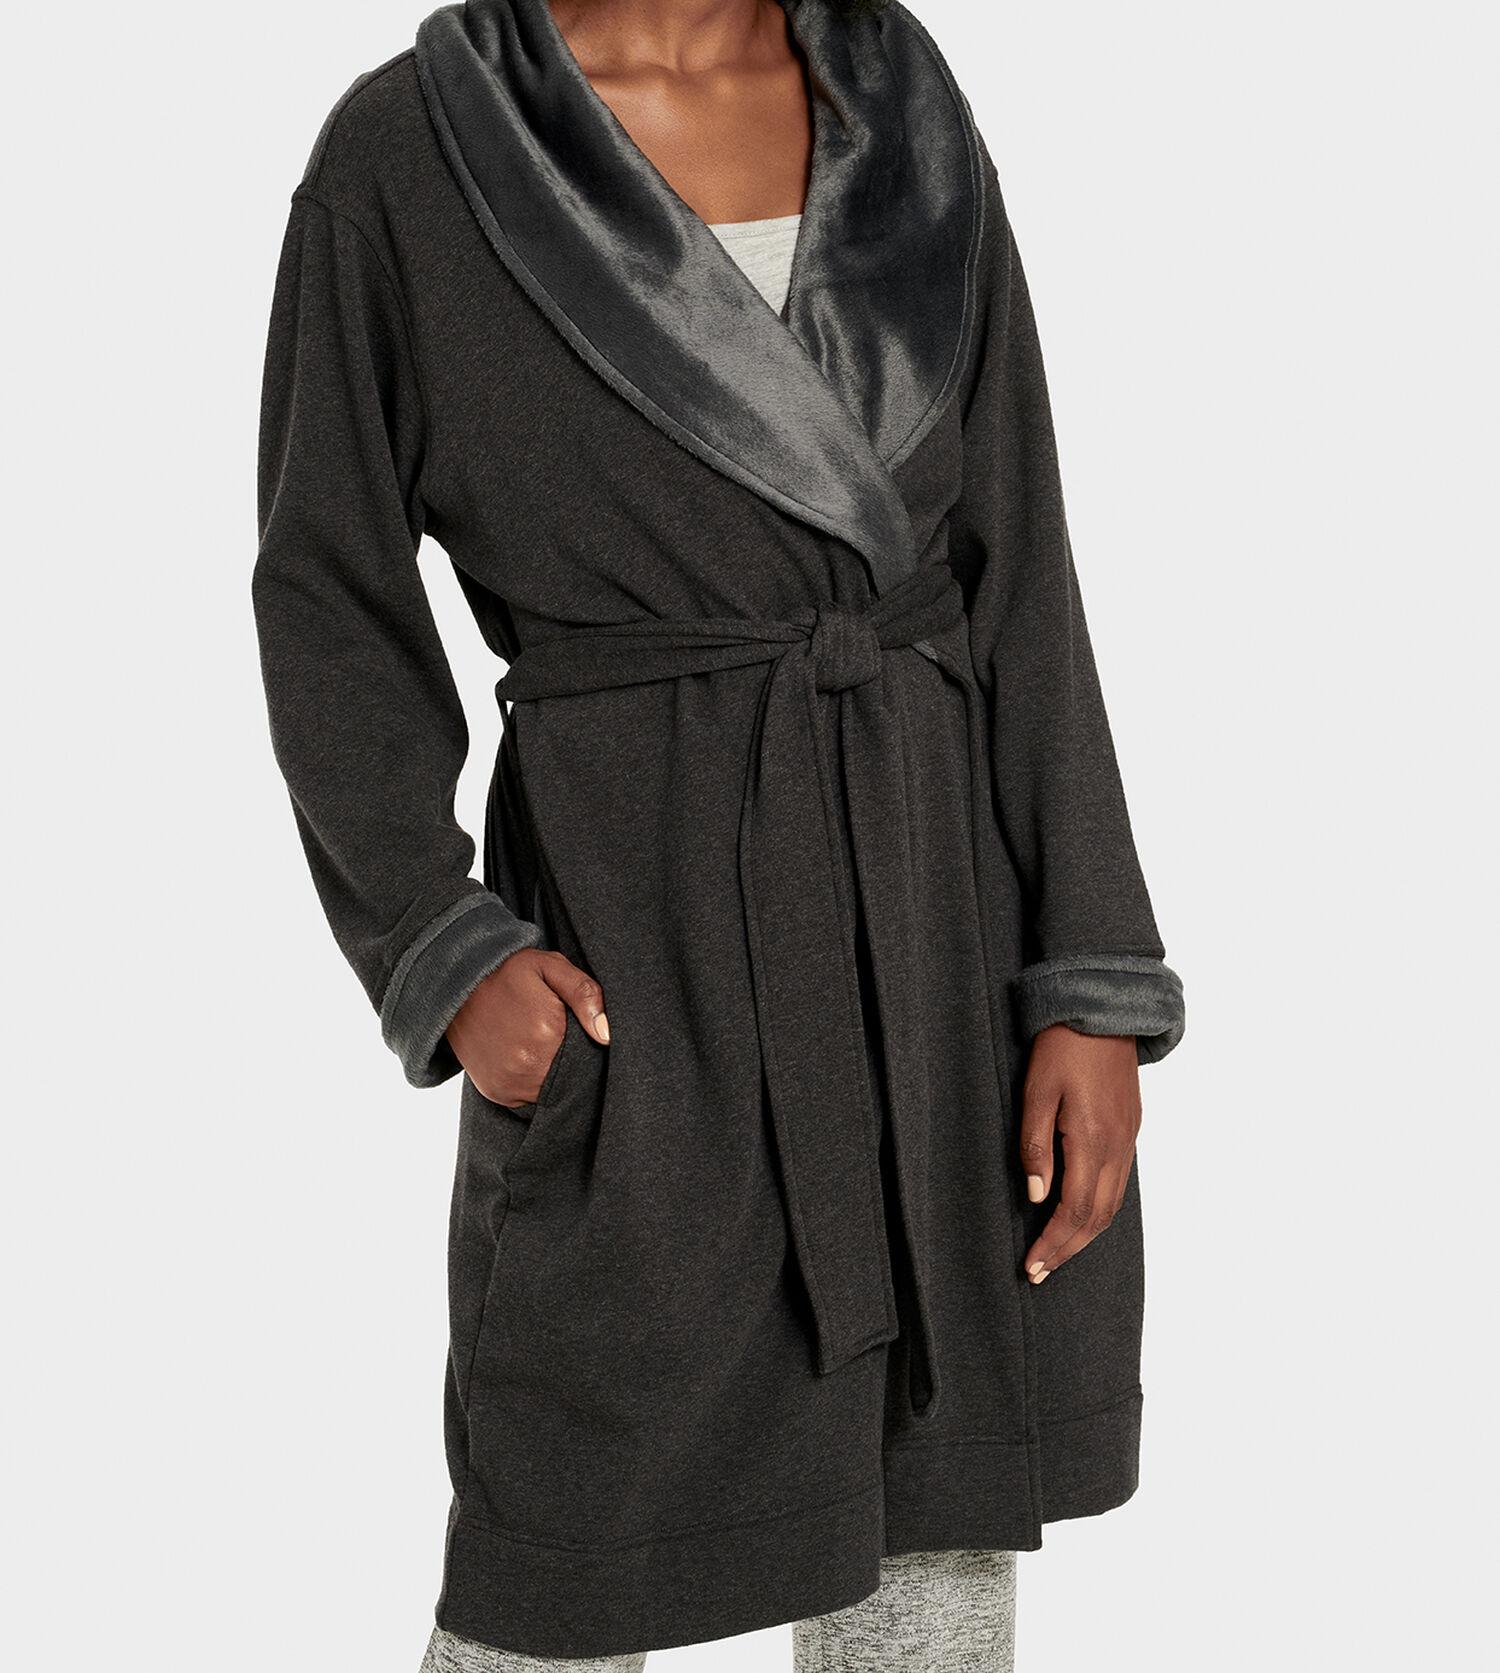 Zoom Duffield II Plus Robe - Image 4 of 5 6b1f040a0